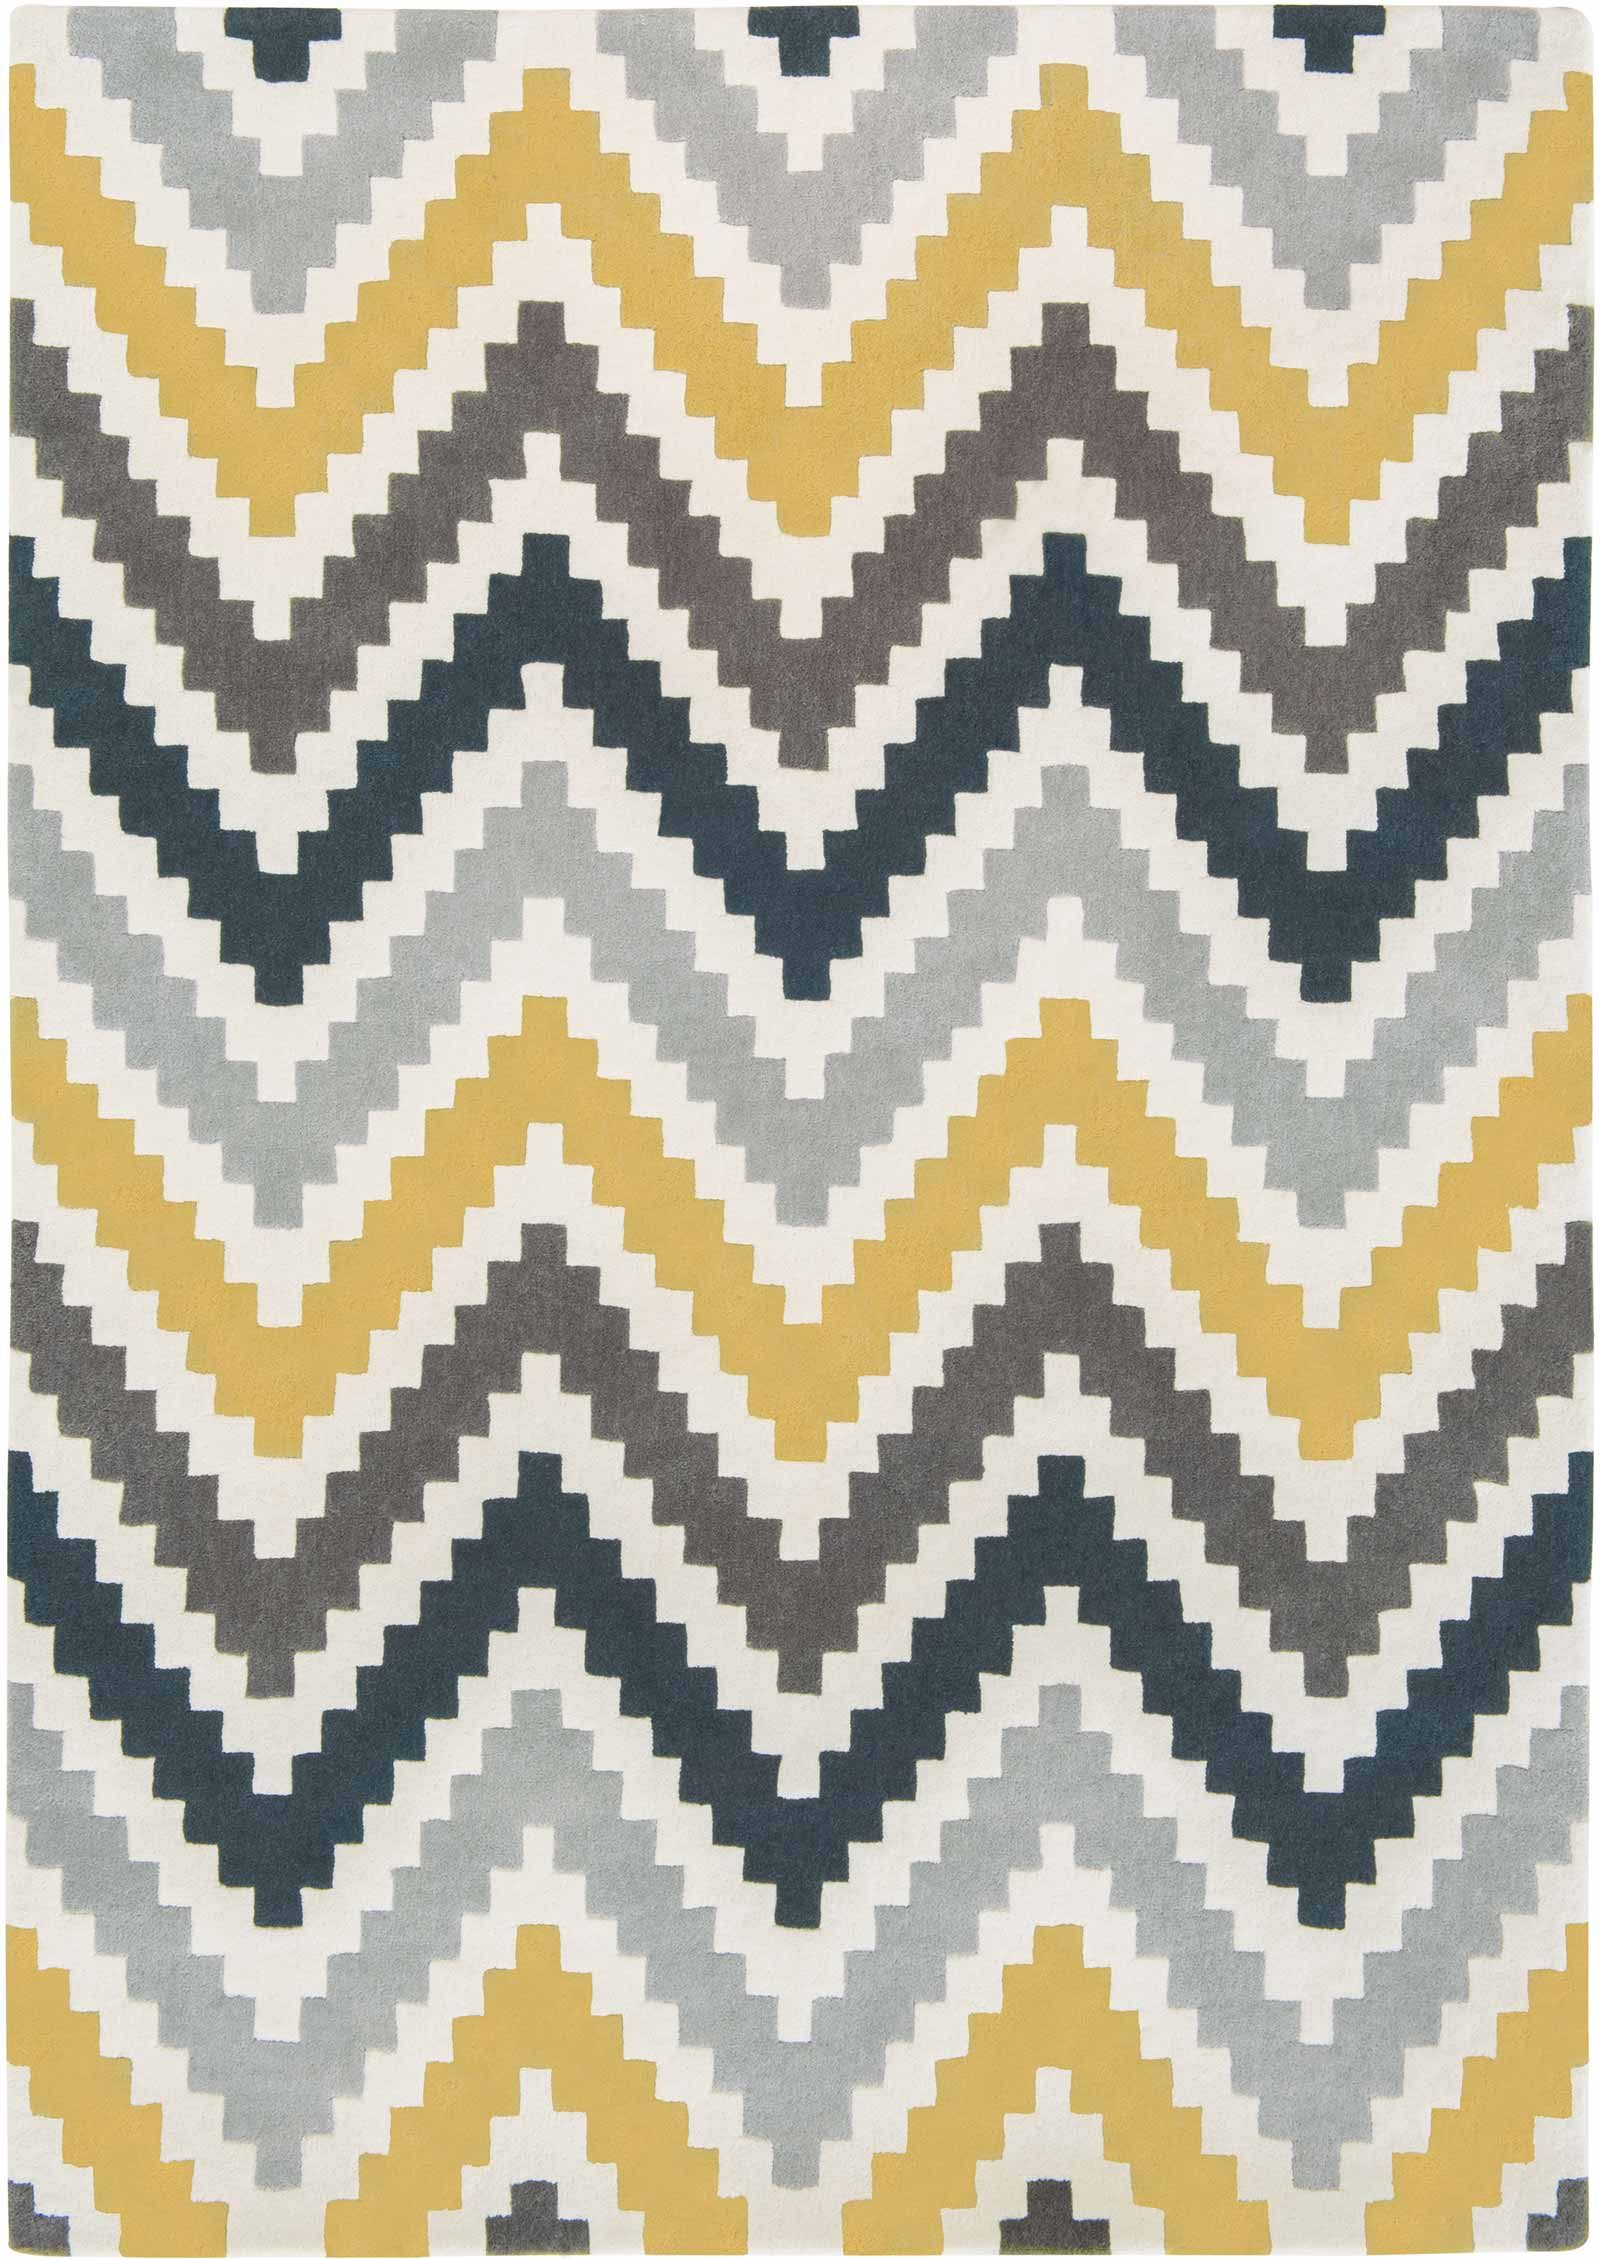 Louis De Poortere tapijt Romo LX 2001 Scala Quince